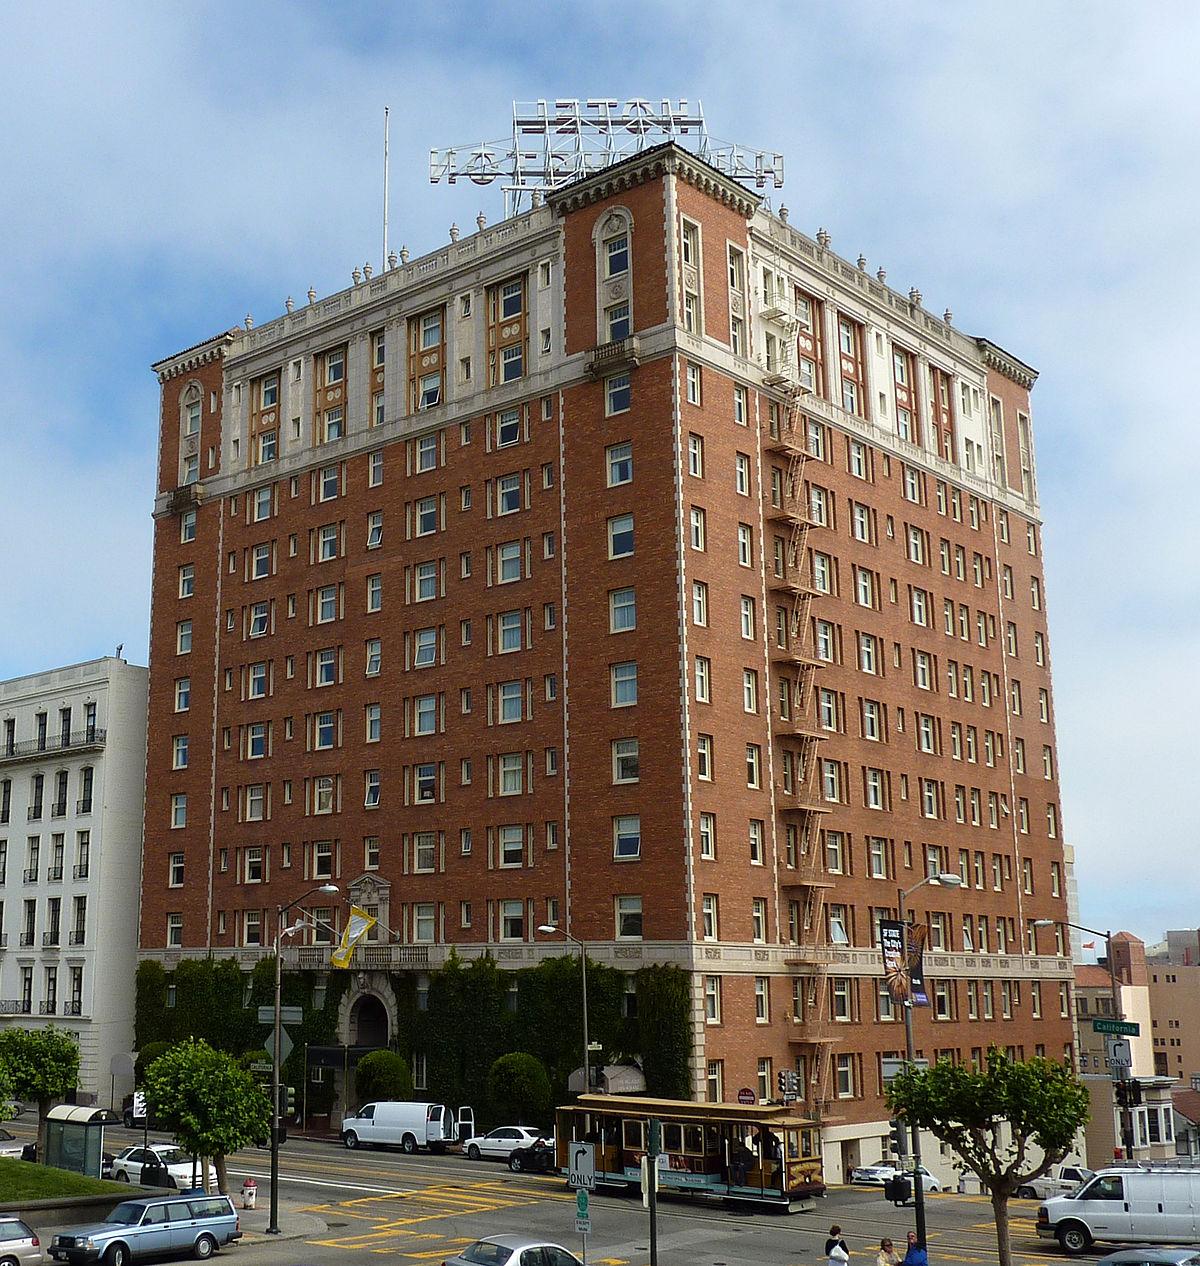 Hotels In Huntington Beach Ca On Pacific Coast Highway